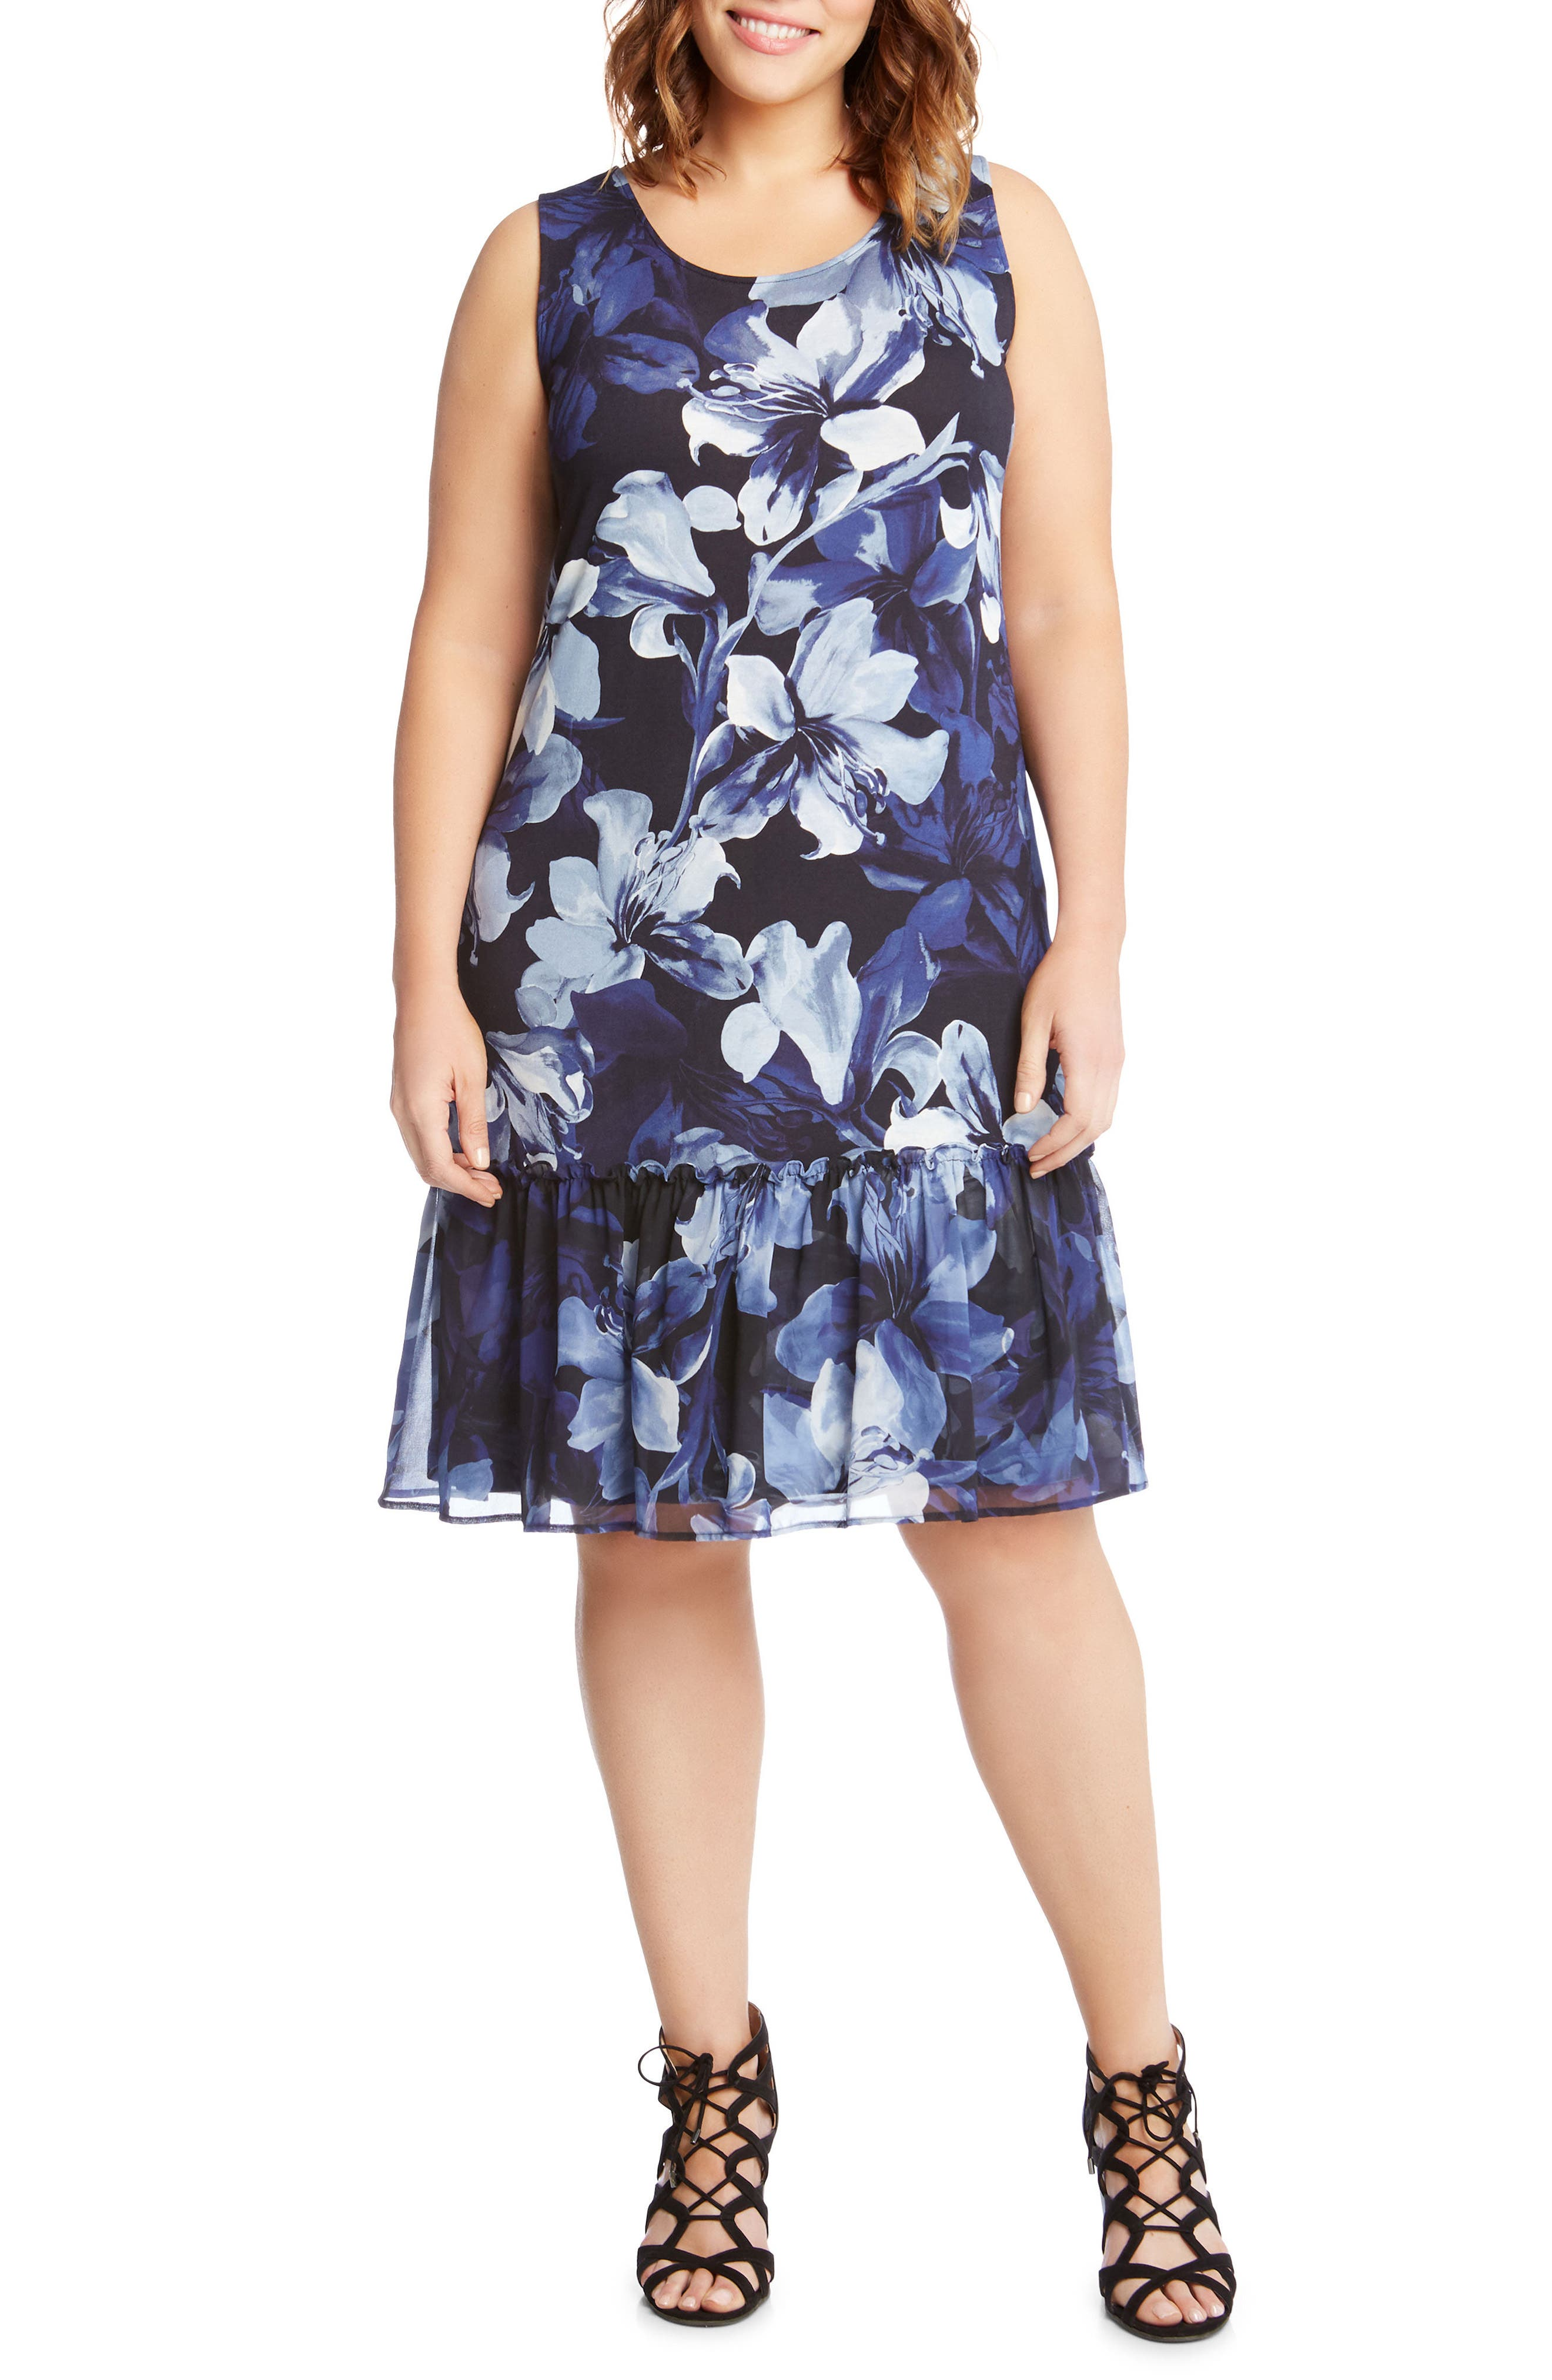 Alternate Image 1 Selected - Karen Kane Floral Ruffle Hem Georgette A-Line Dress (Plus Size)